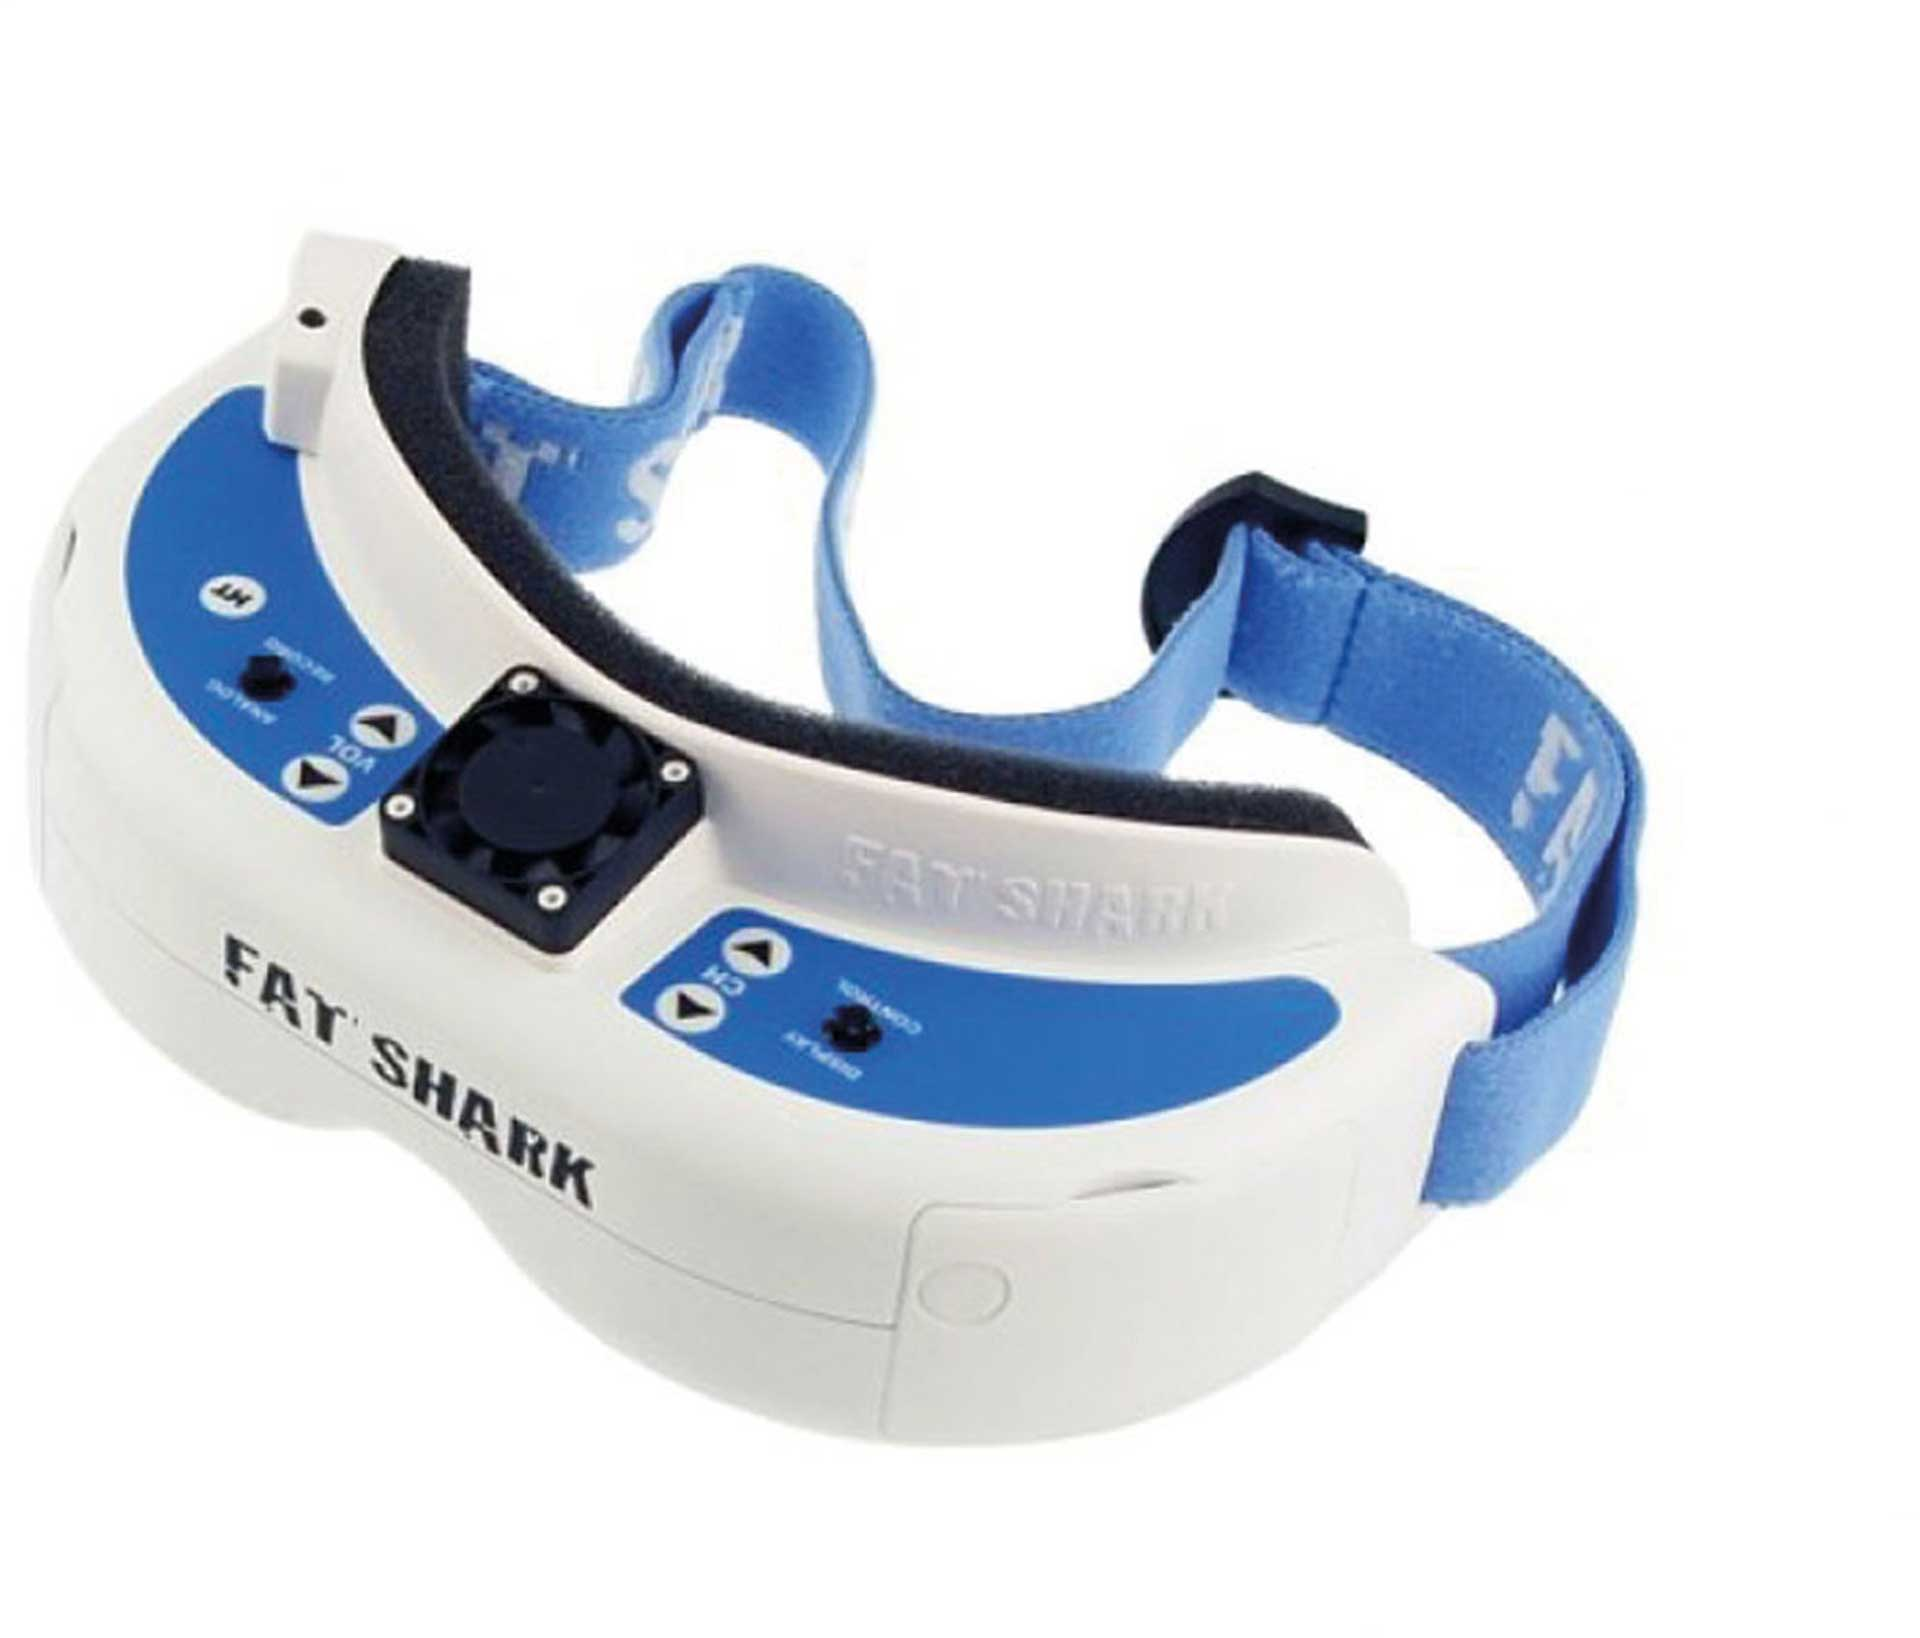 FAT SHARK DOMINATOR V3 FPV VIDEOBRILLE INCL. AKKU